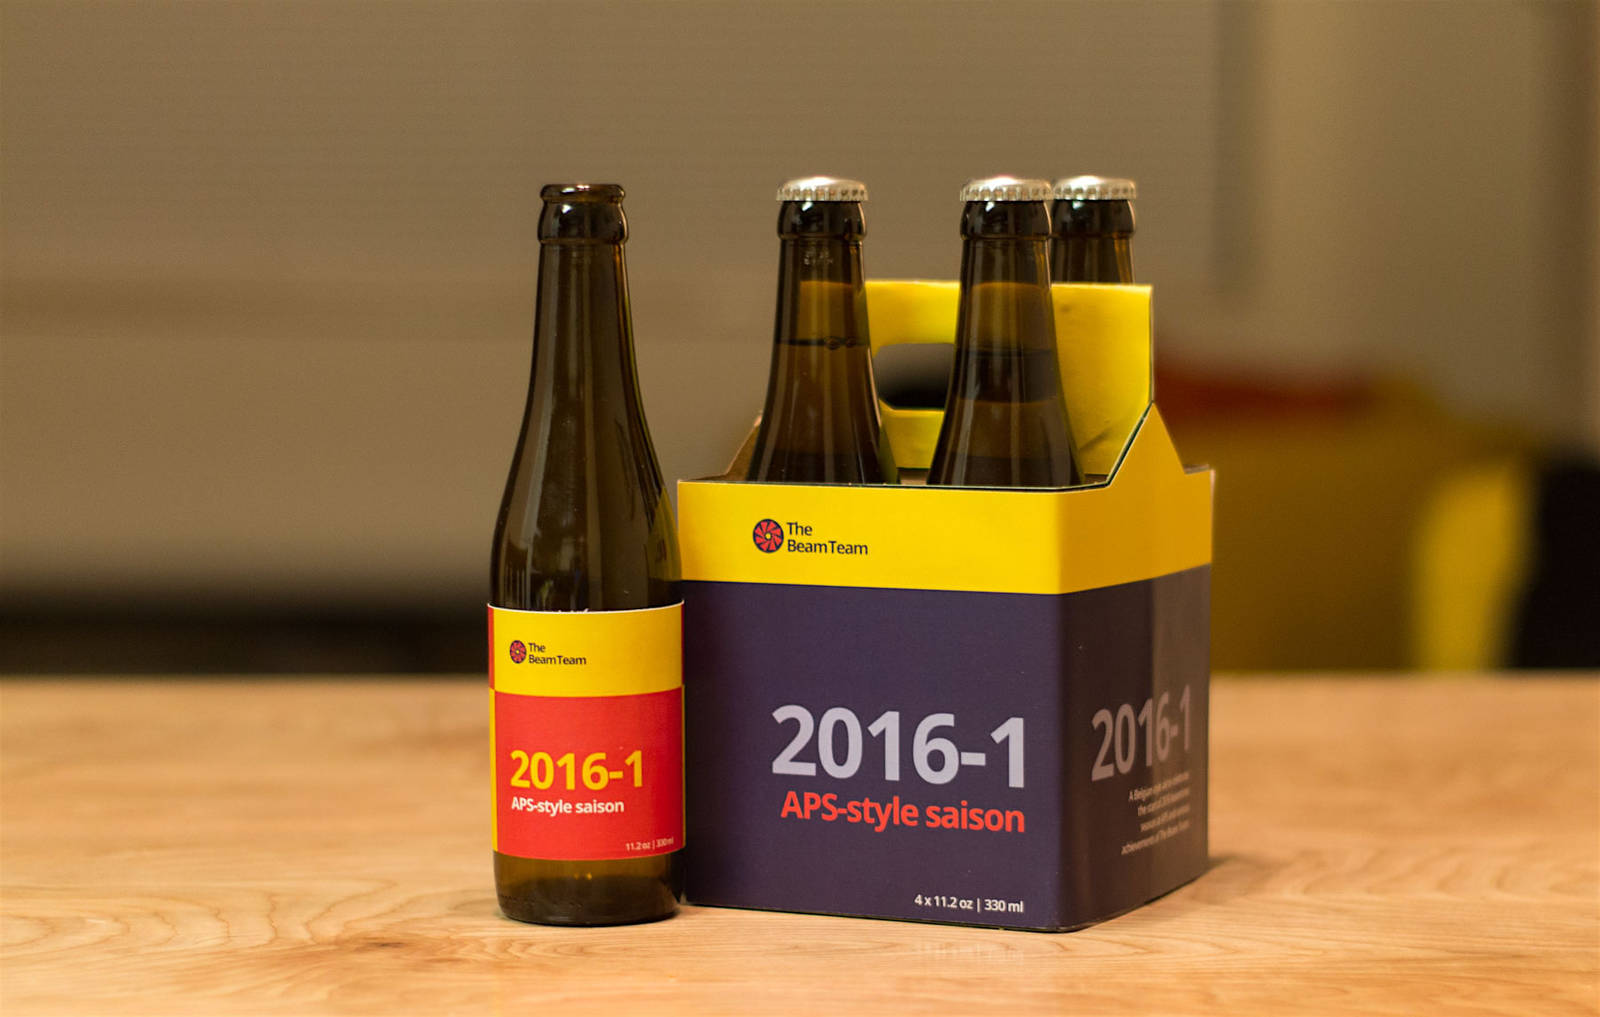 The Beam Team brew carton